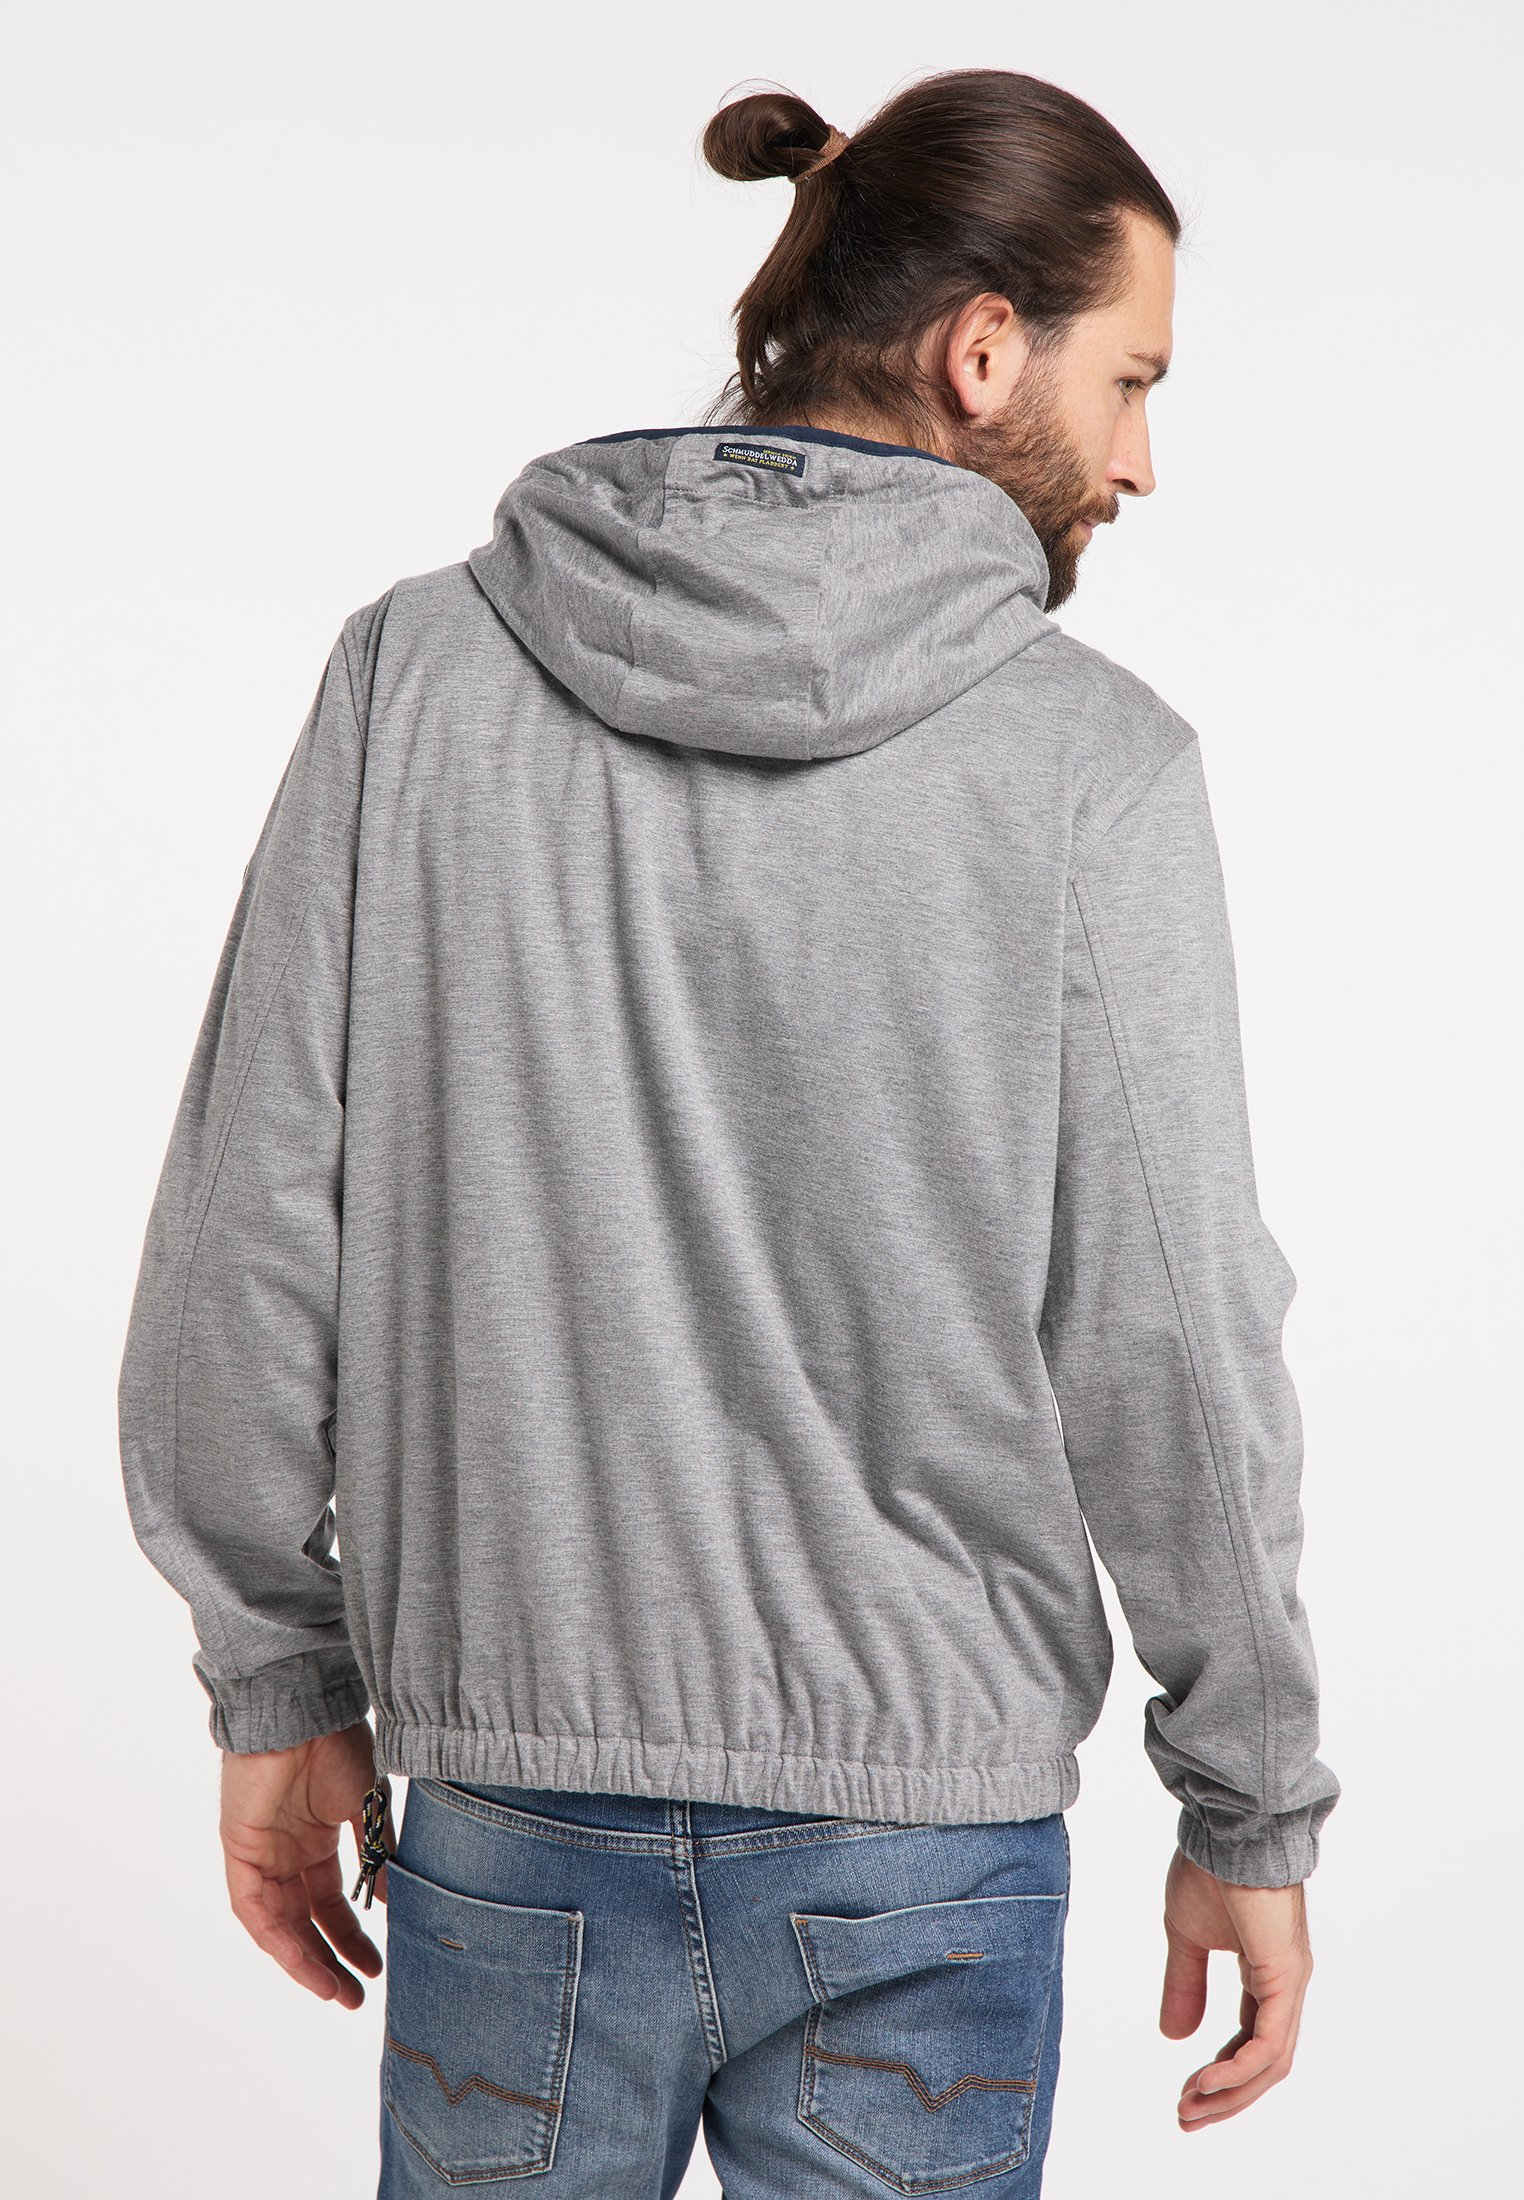 Schmuddelwedda Regenjacke / Wasserabweisende Jacke - Grau Melange